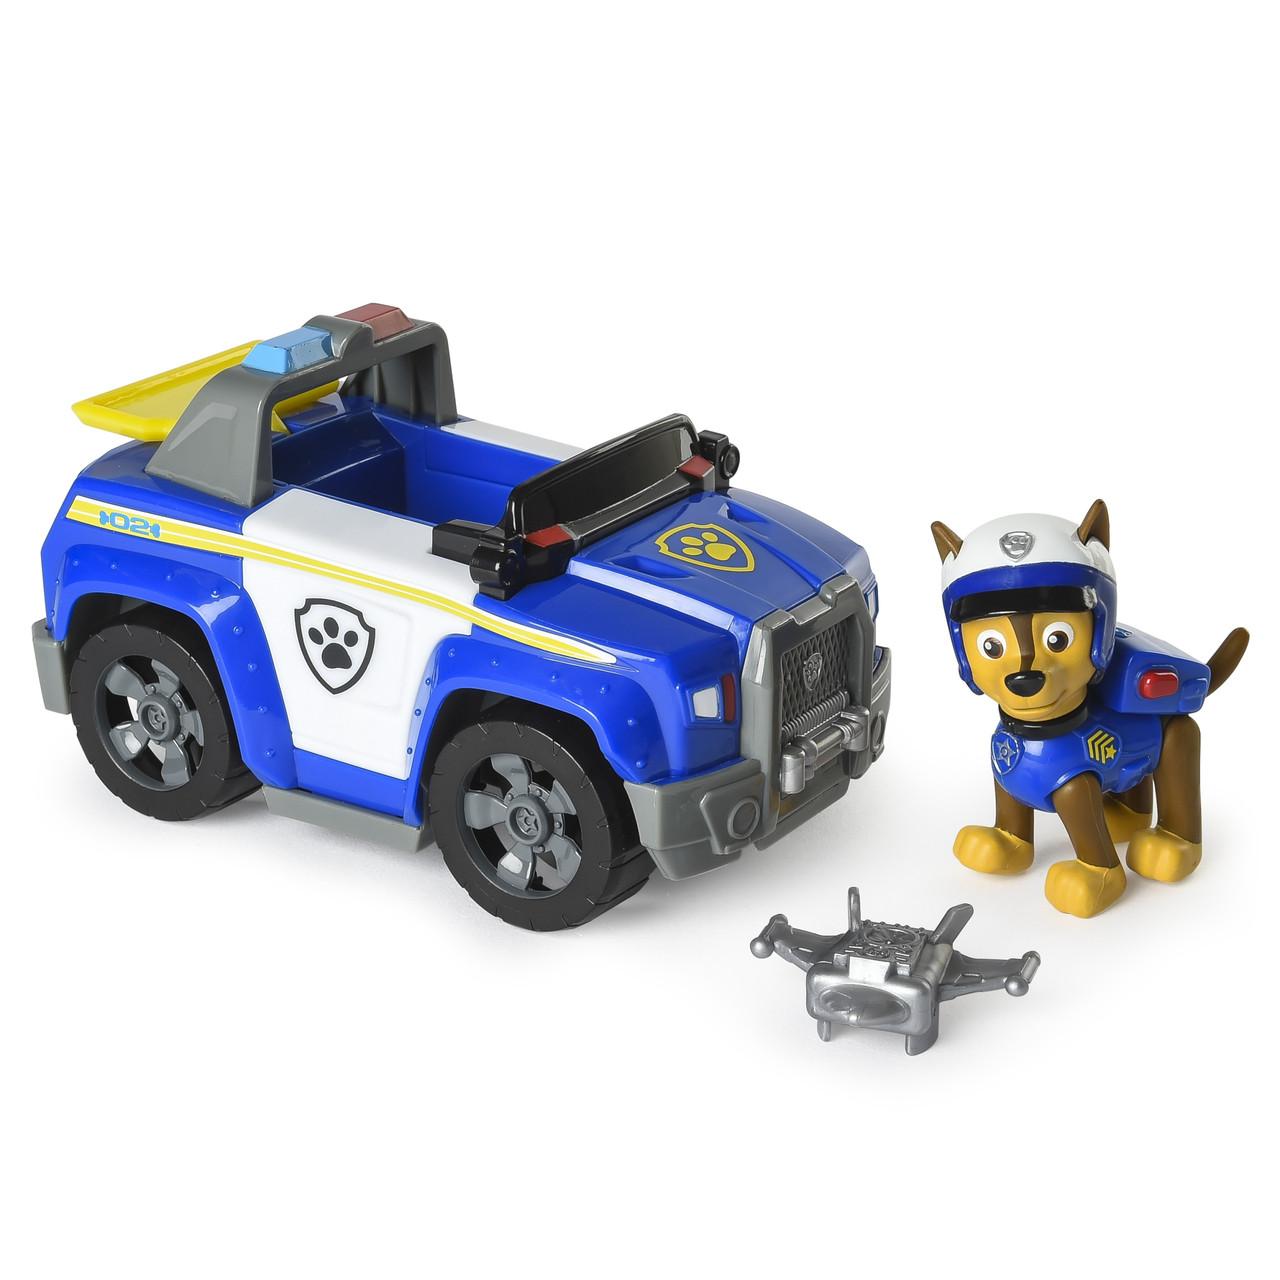 Игровой набор Чейз с машинкой Щенячий Патруль PAW Patrol  Chase's Highway Patrol Cruiser with Launcher and Ch